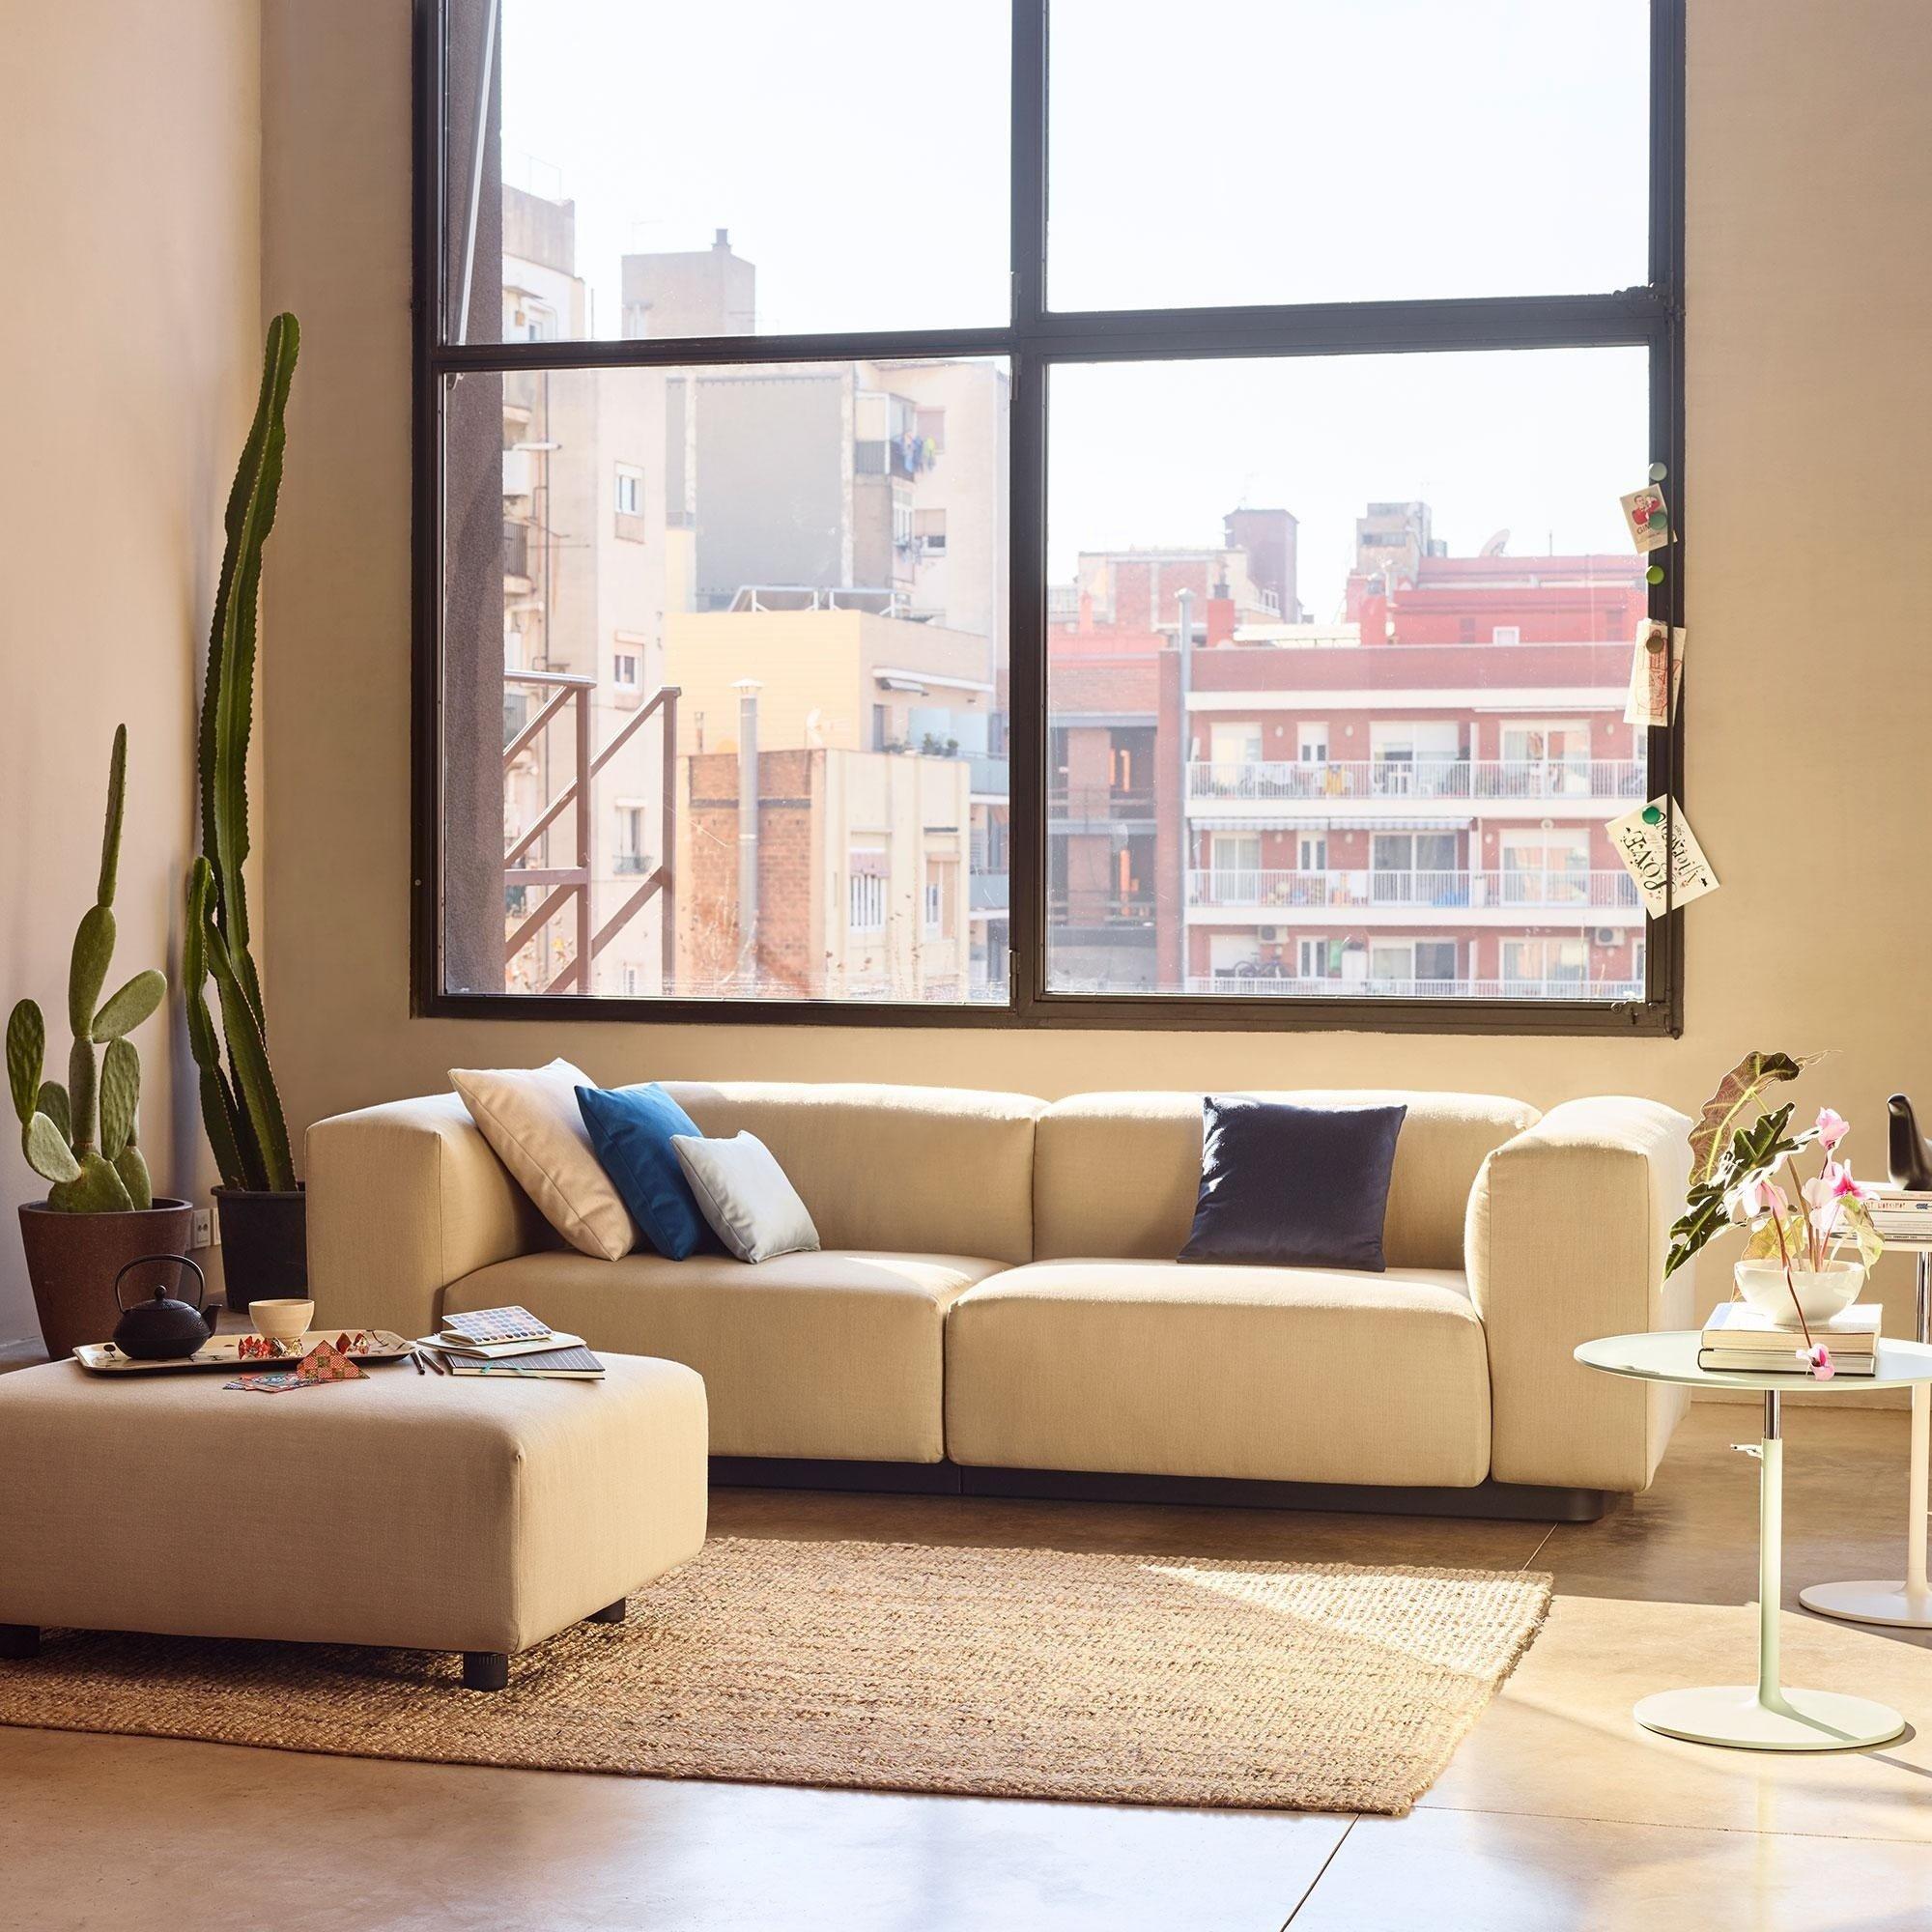 Vitra Soft Modular 2-Sitzer Sofa | AmbienteDirect